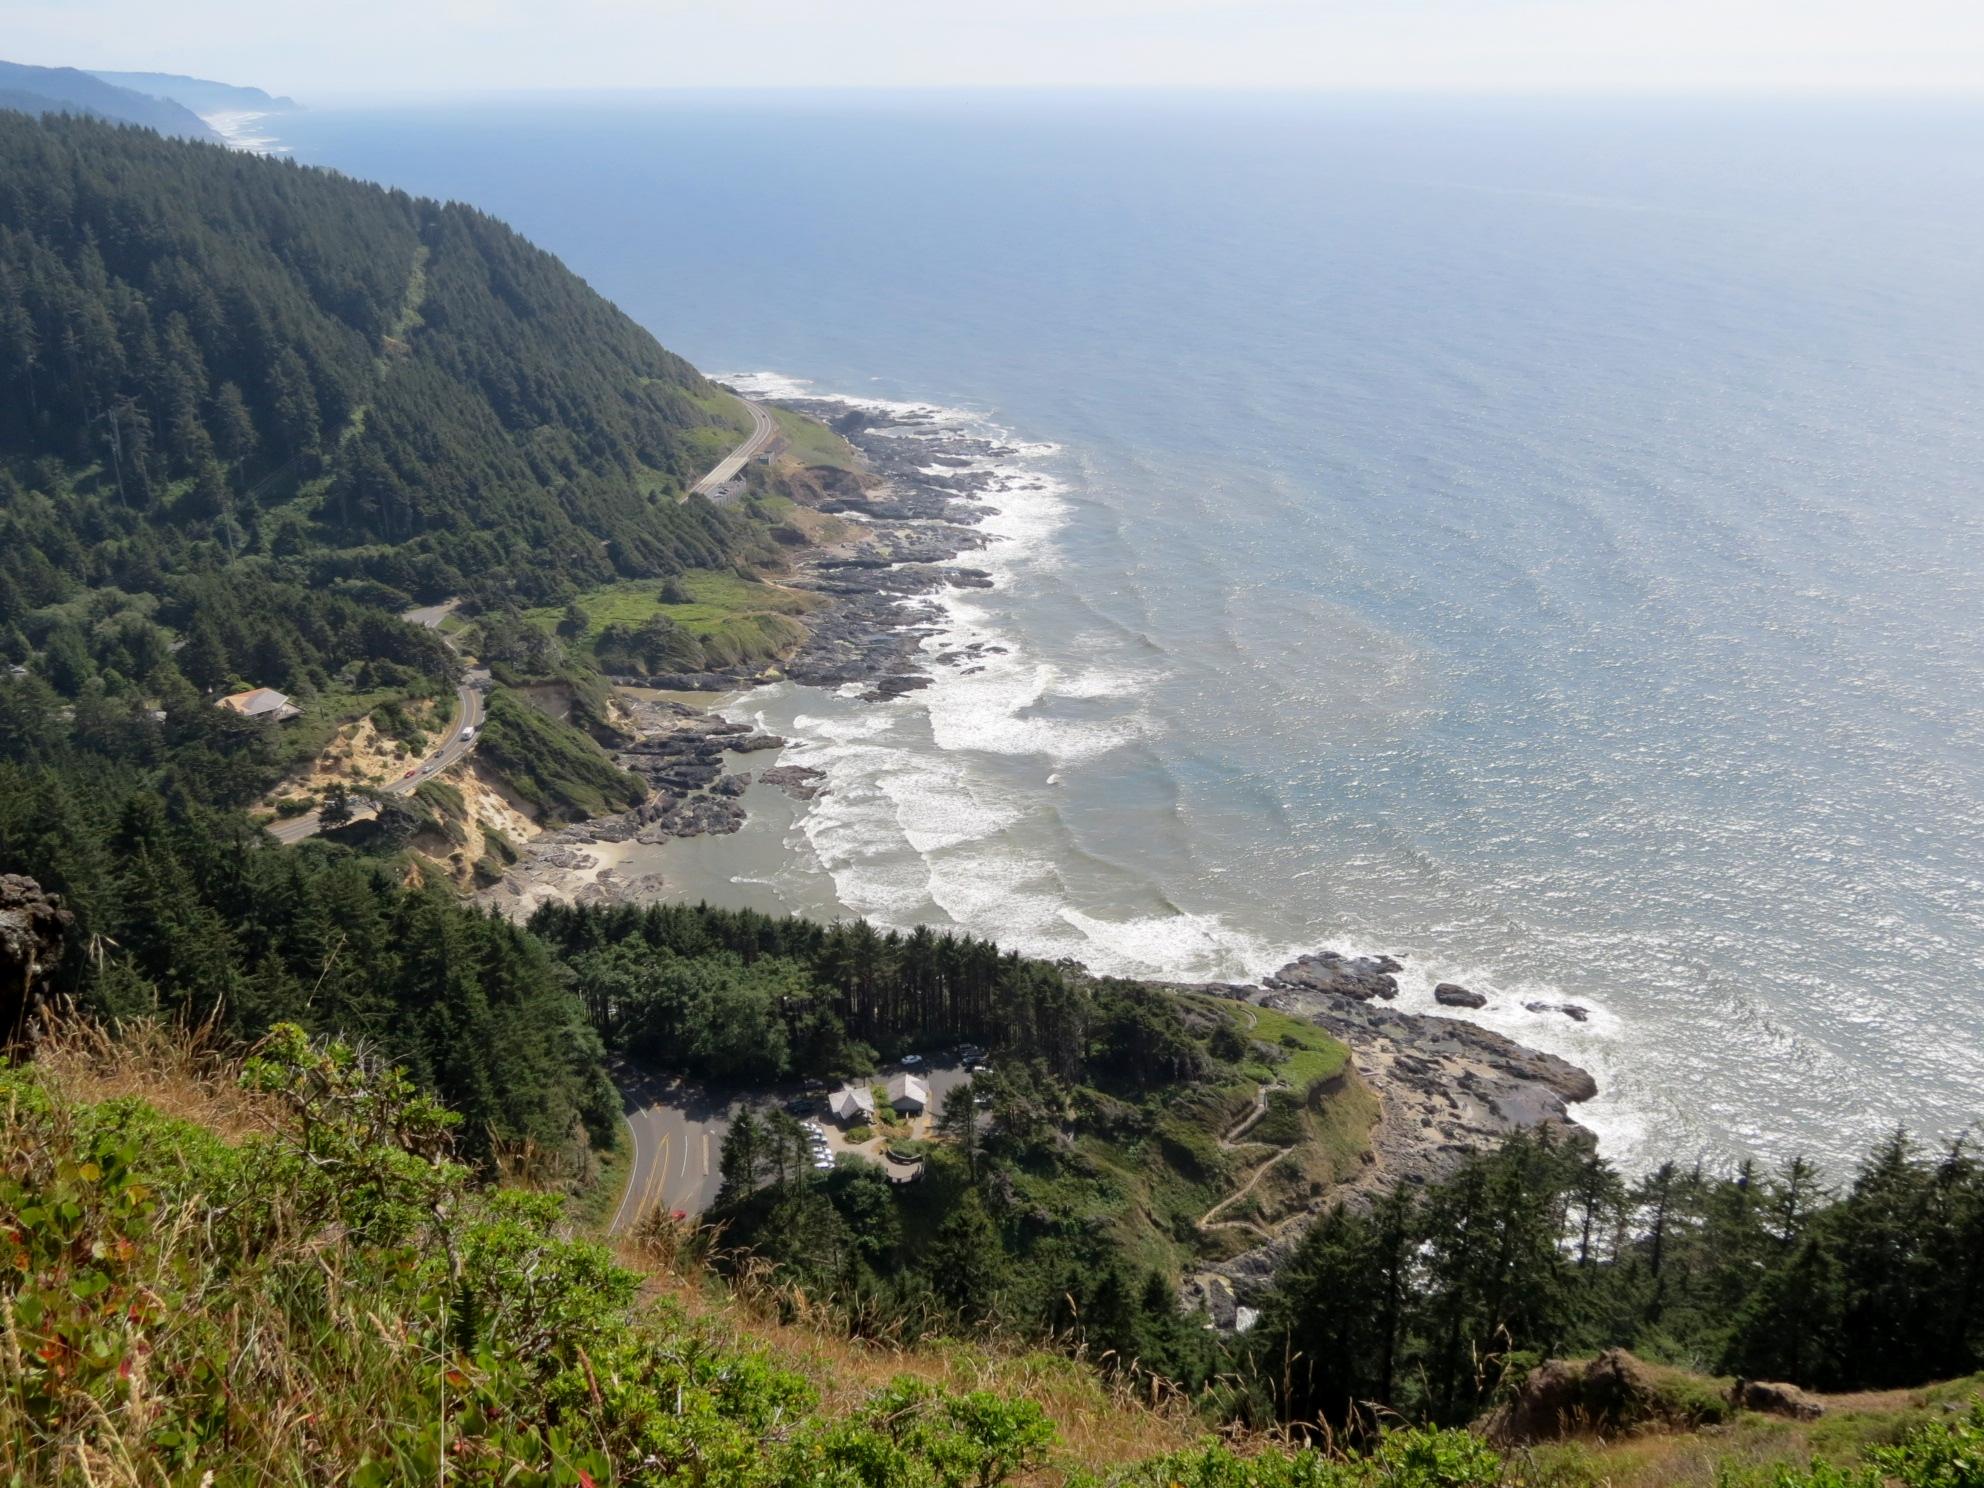 Cape Perpetua Overlook -800' above the Pacific Ocean